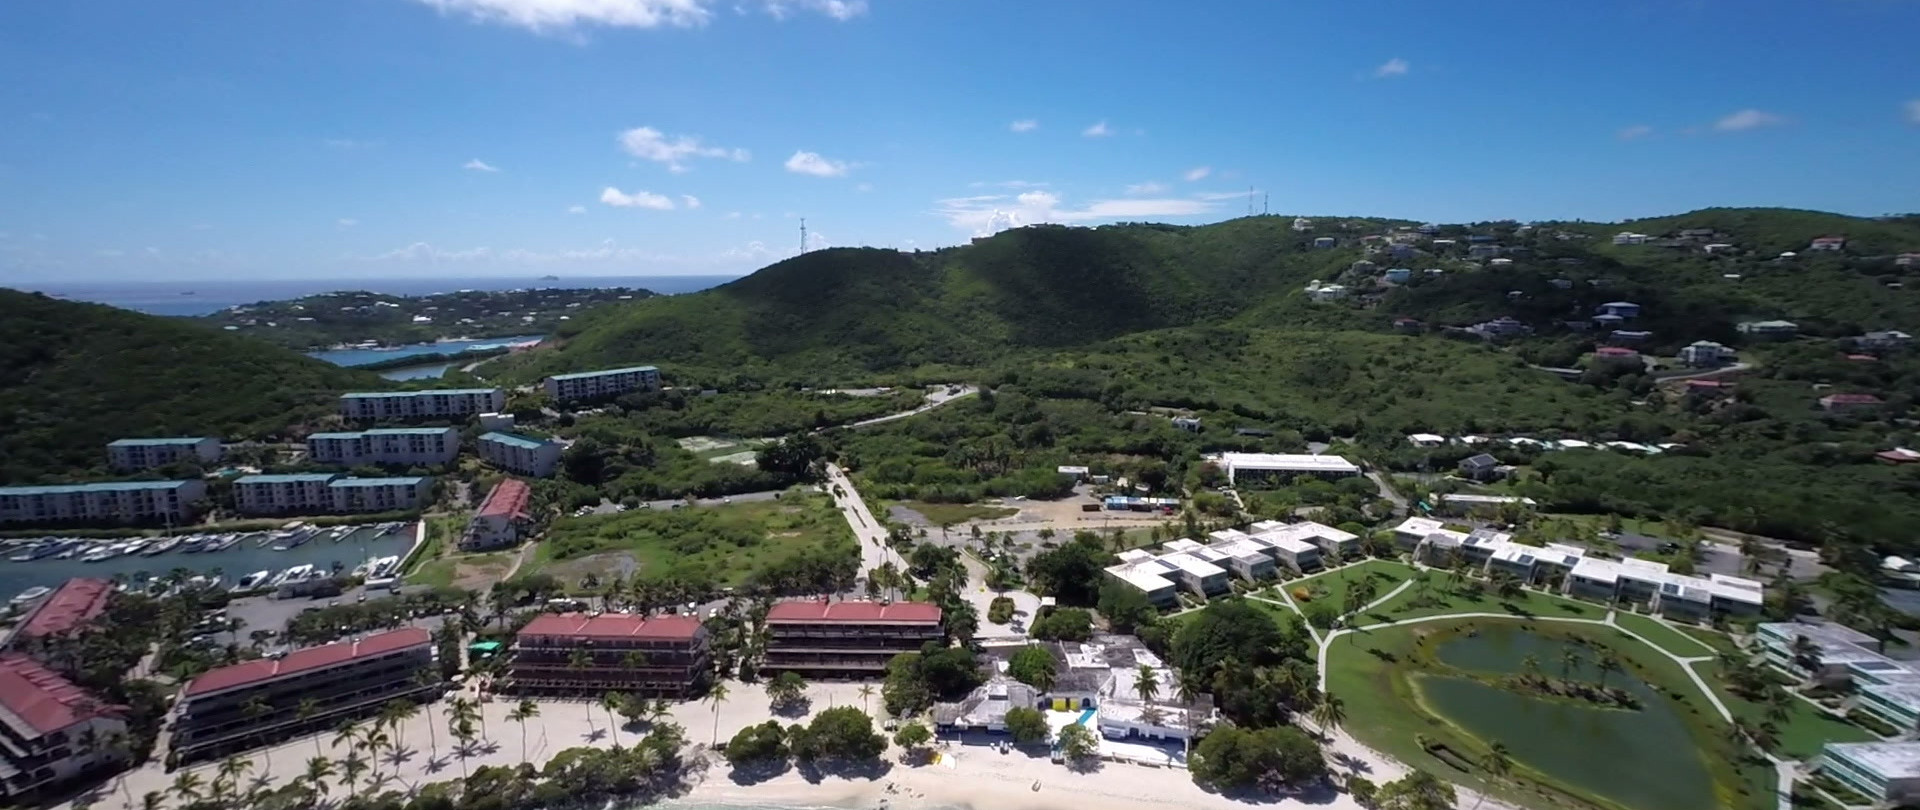 Charter Boat St Thomas | Aerial video of Sapphire beach, St.Thomas | Phoenix Island Charters marina